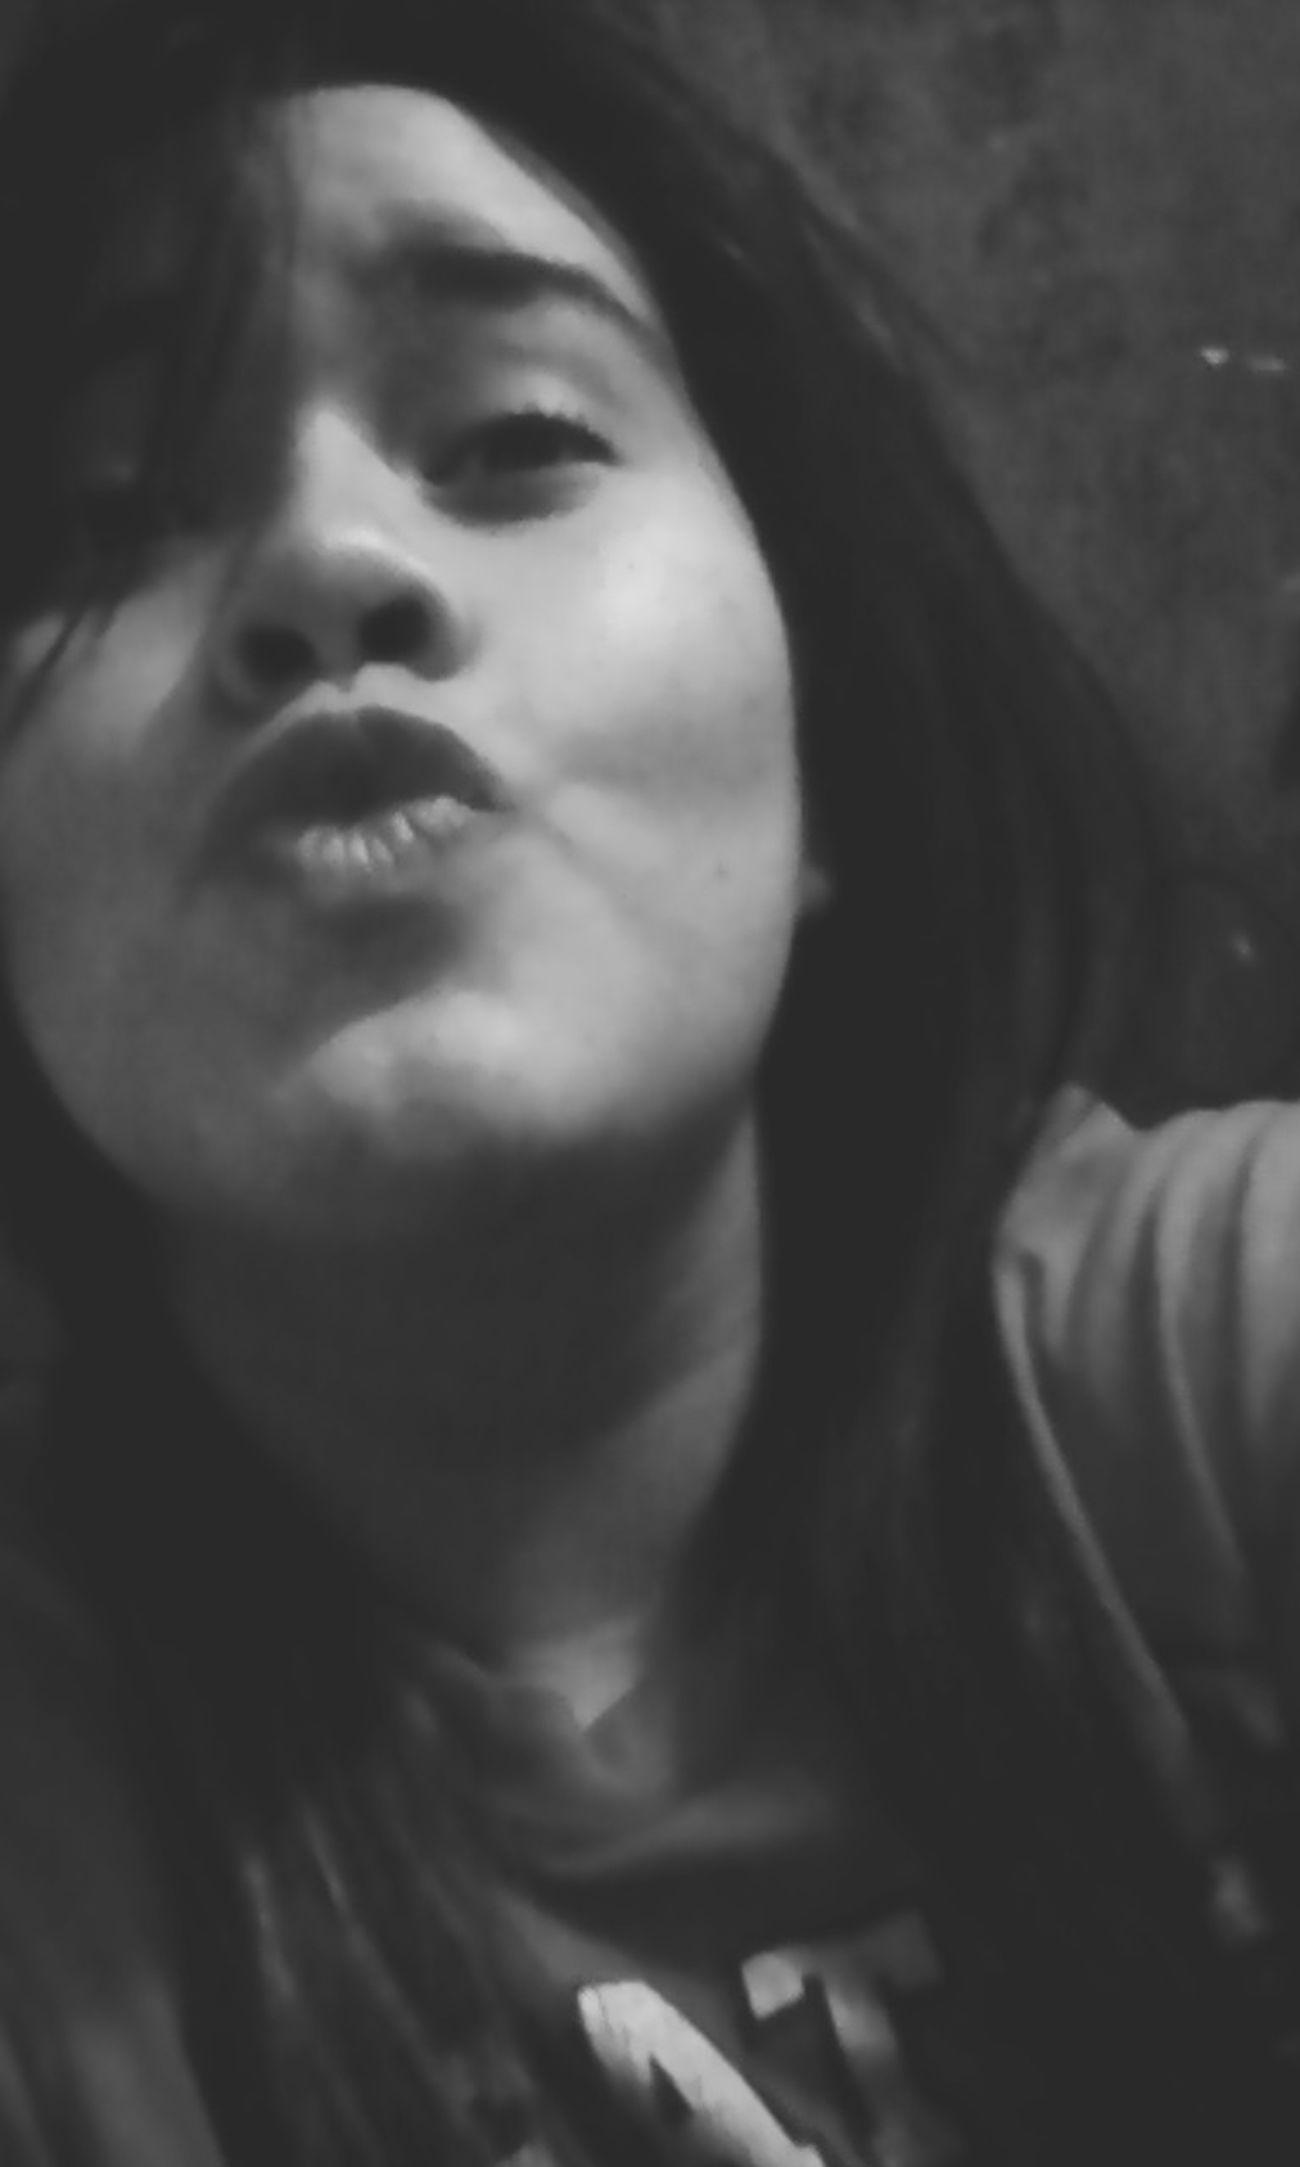 Blancoynegro Ojitos<3 Besos :* Cabello♥